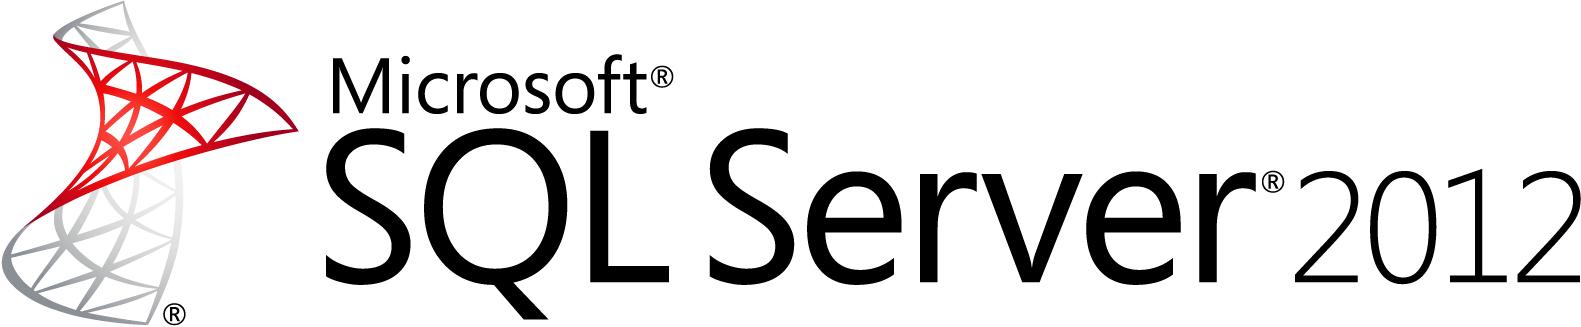 Microsoft SQL Server Business Intelligence 2012